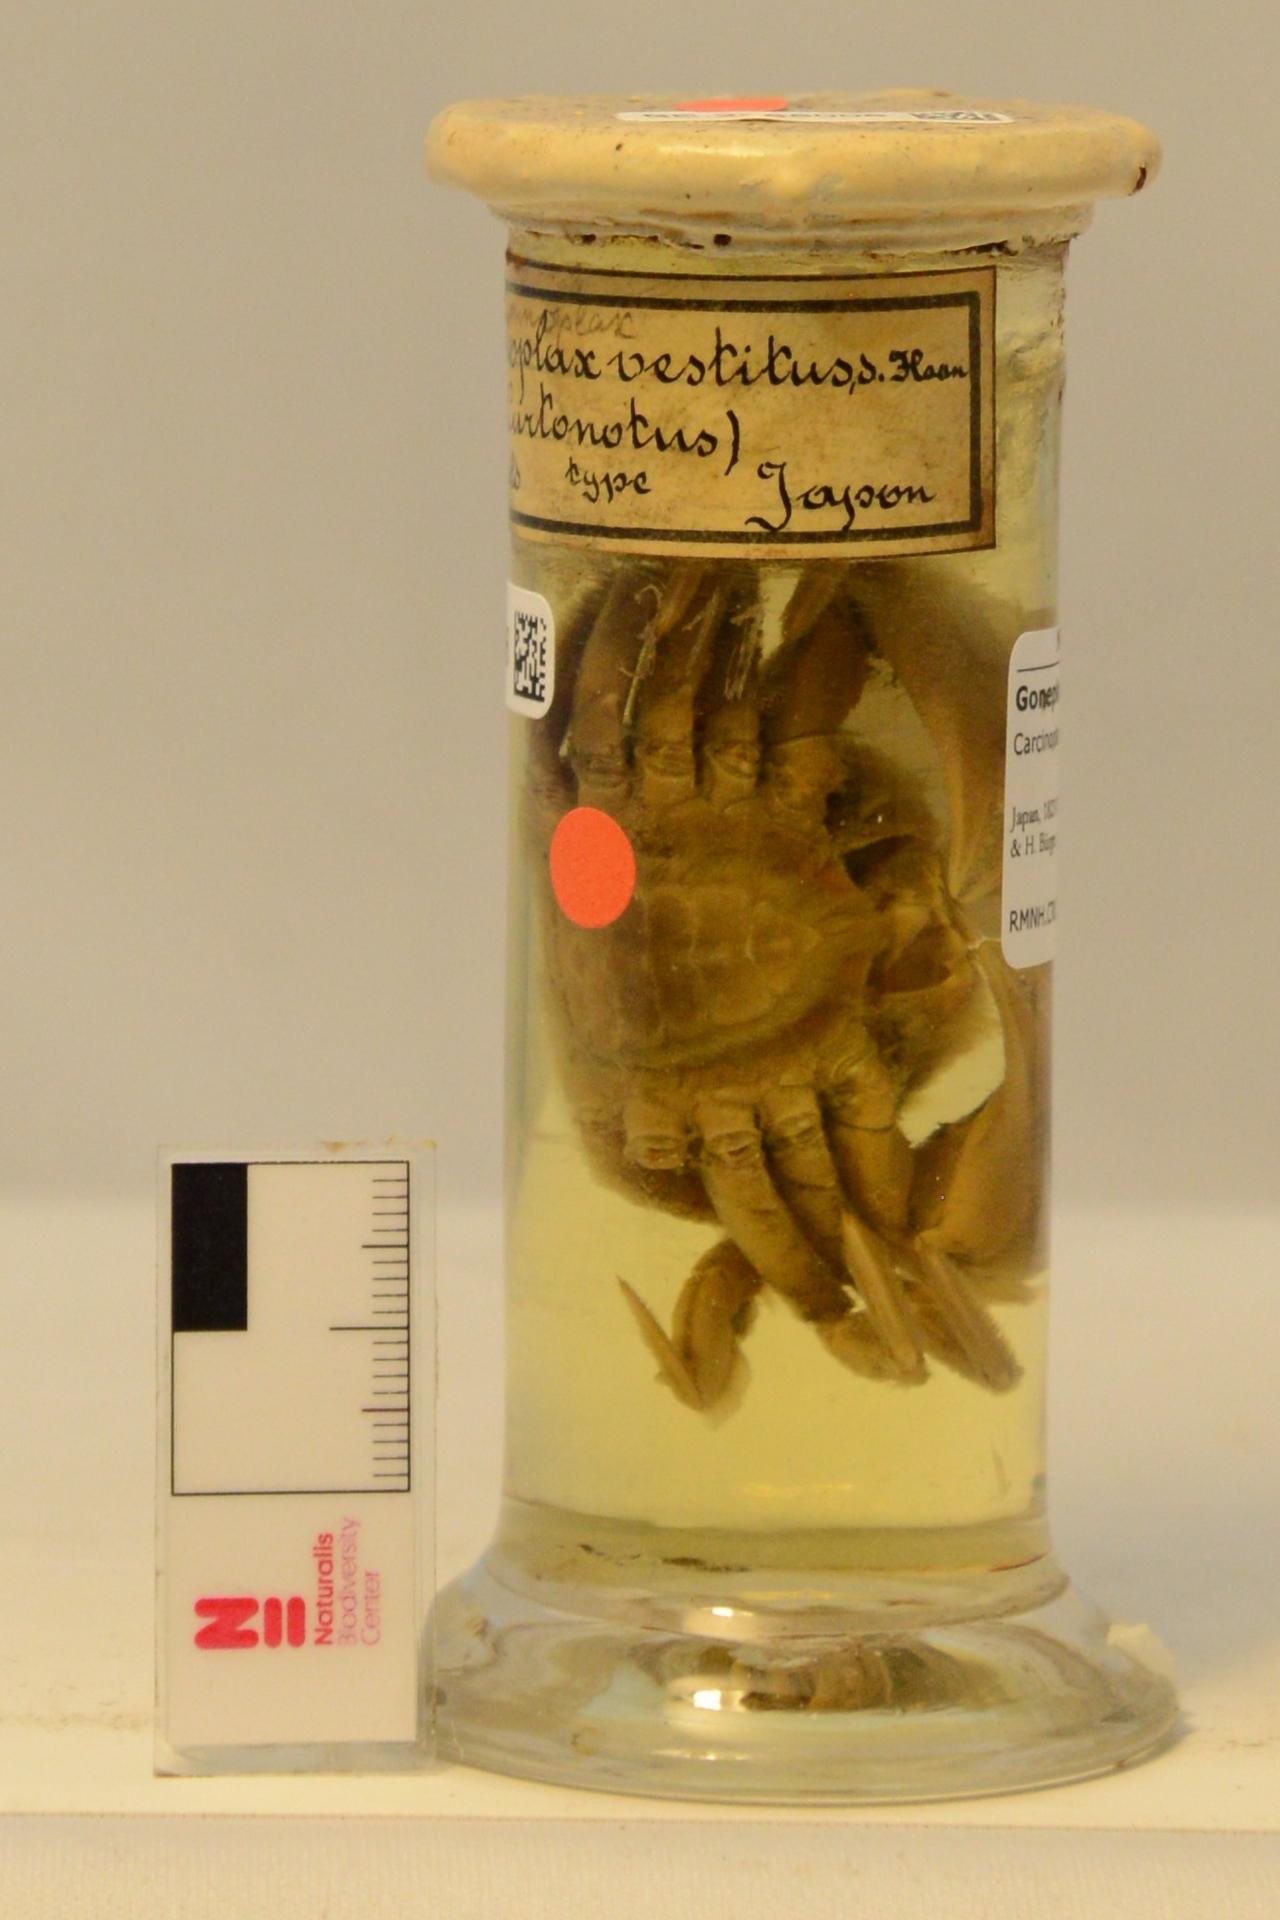 RMNH.CRUS.D.311   Carcinoplax vestitus (De Haan, 1833)